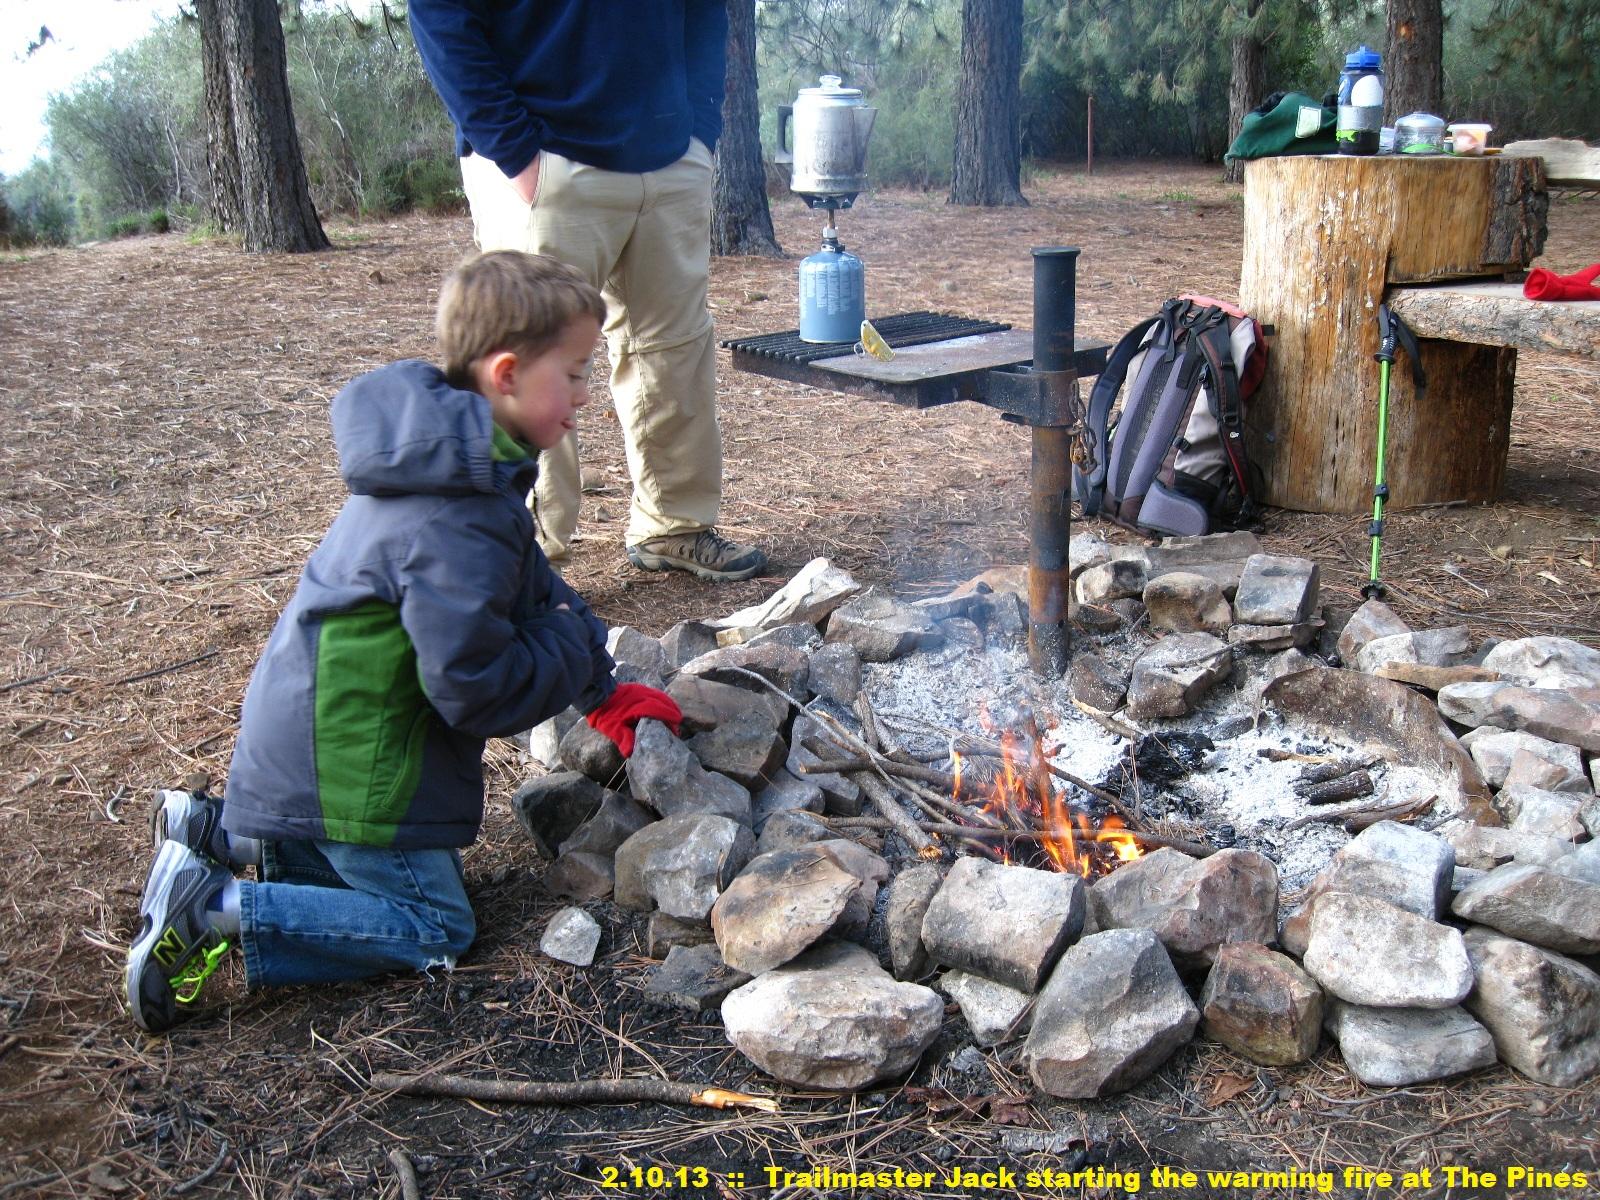 2013-02-10_HornCanyon-Pines (17)